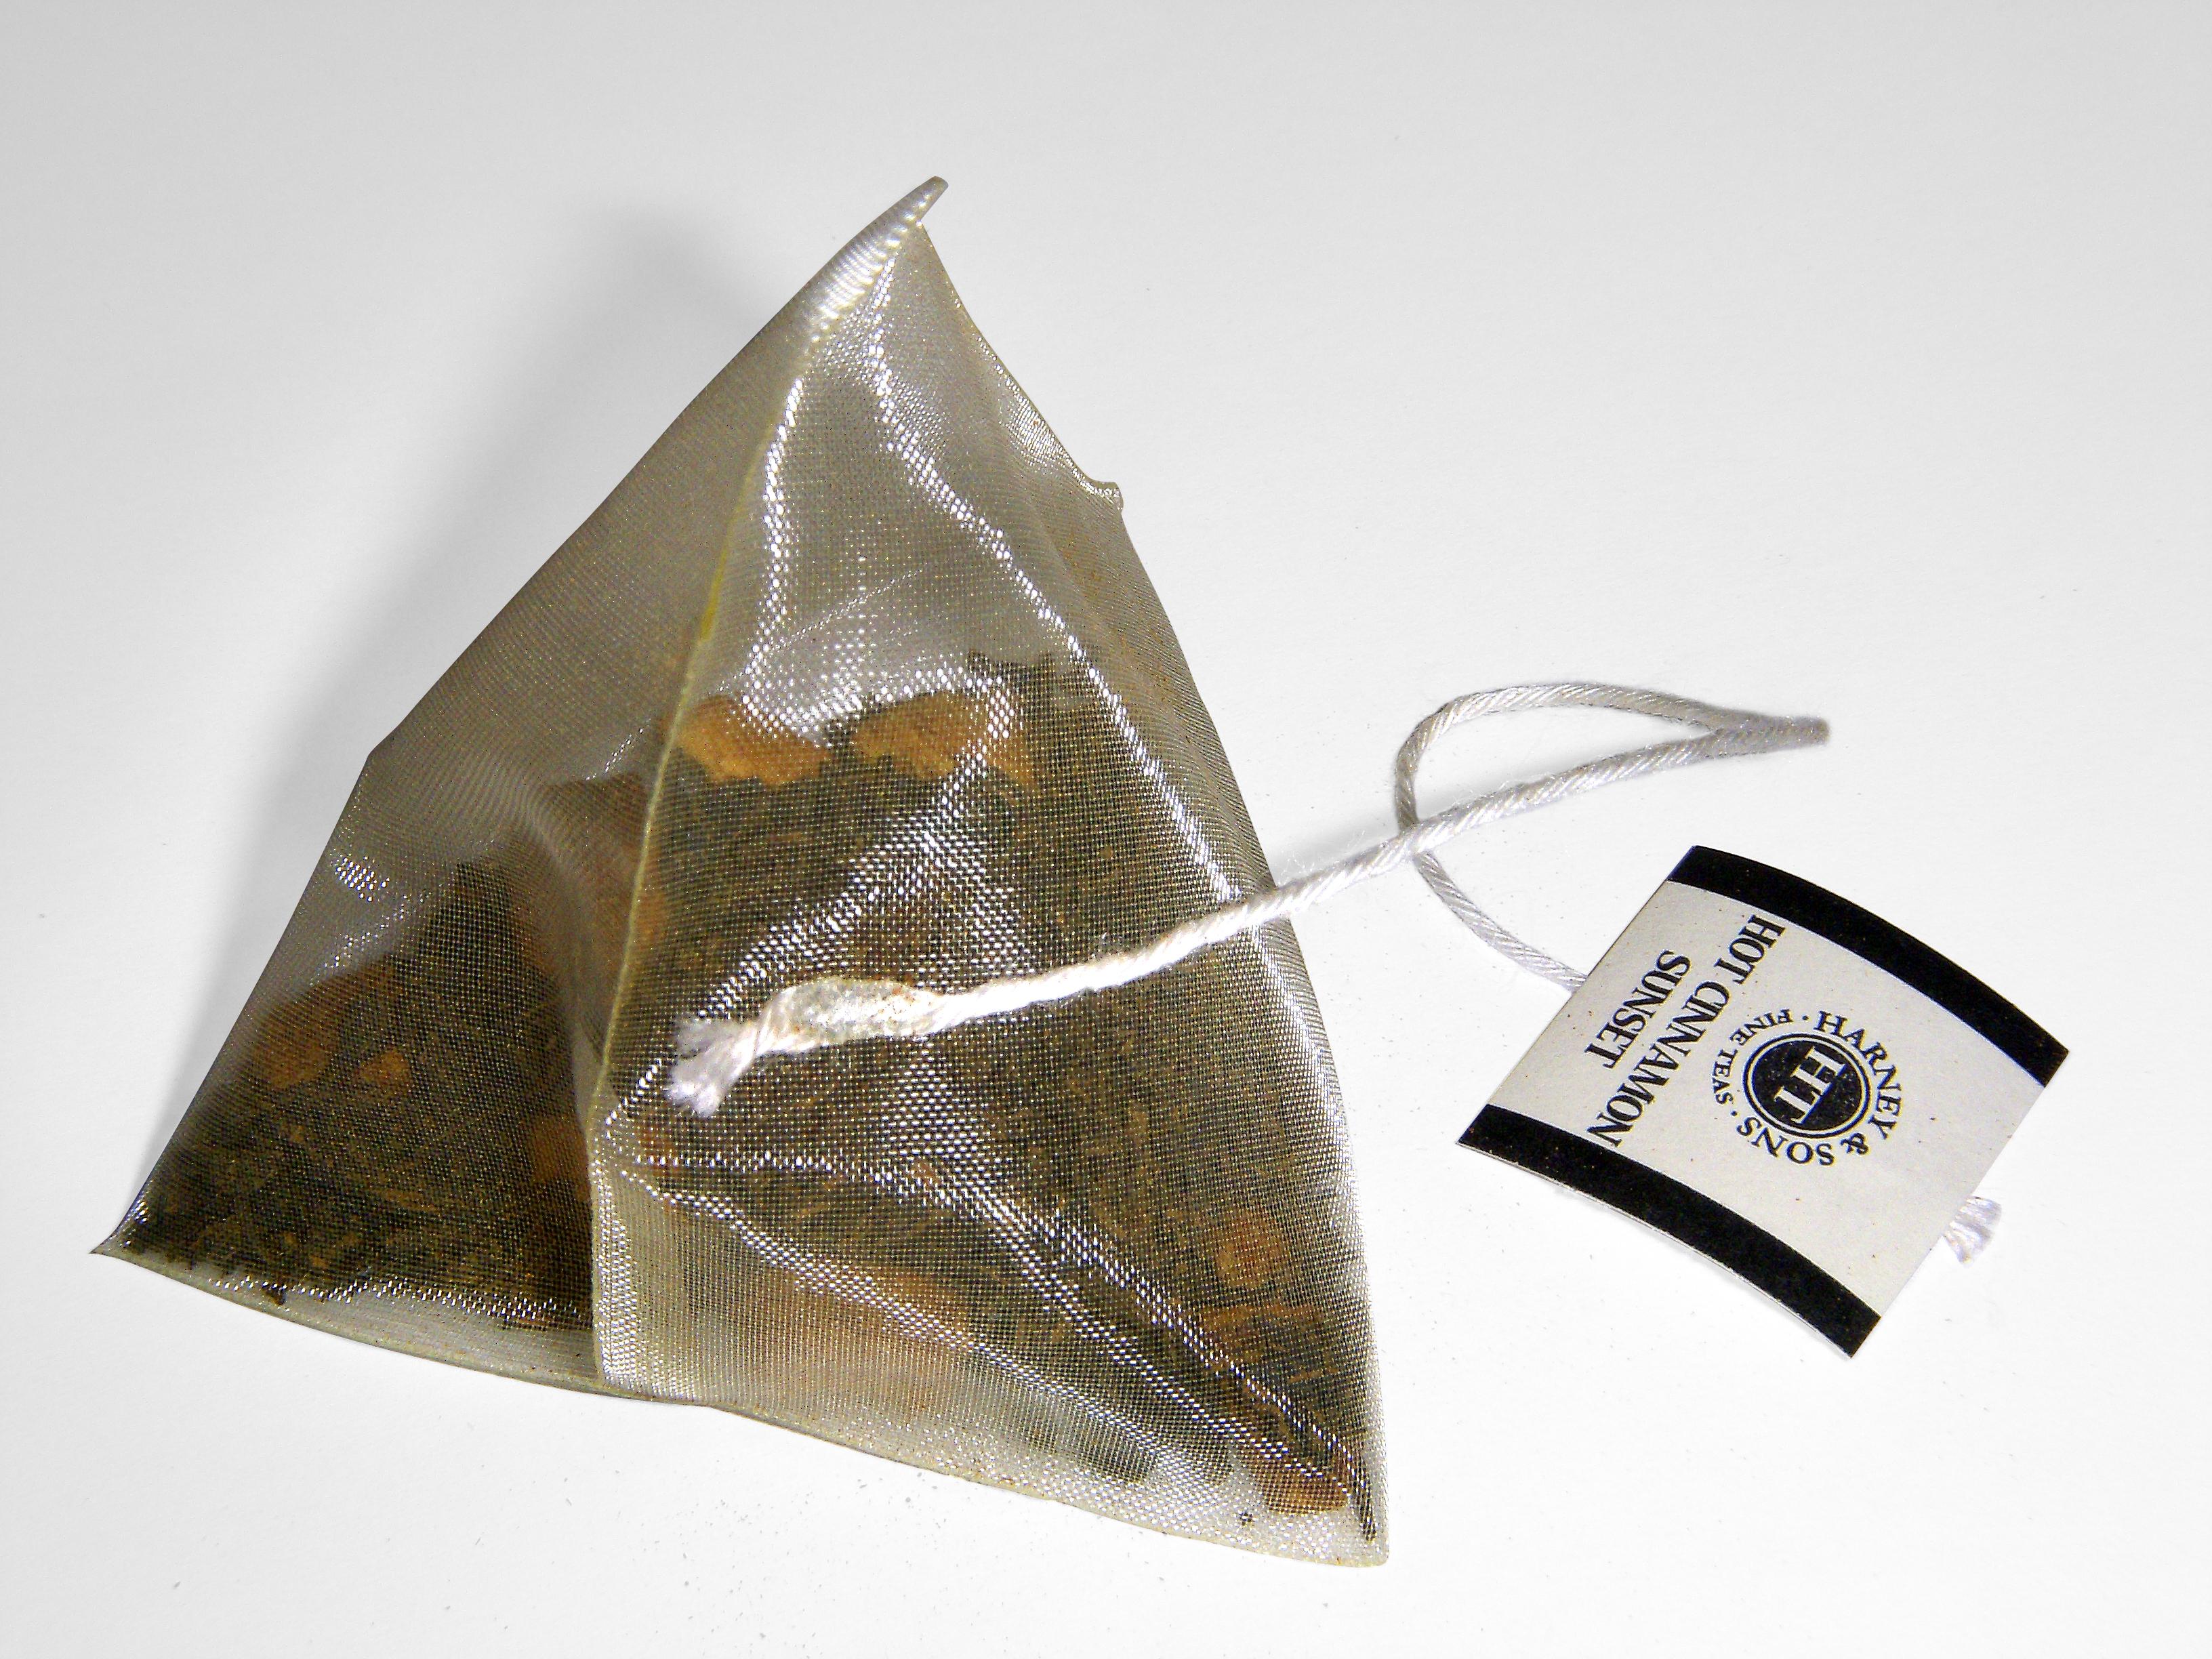 File:Pyramidal silk tea bag.jpg - Wikimedia Commons